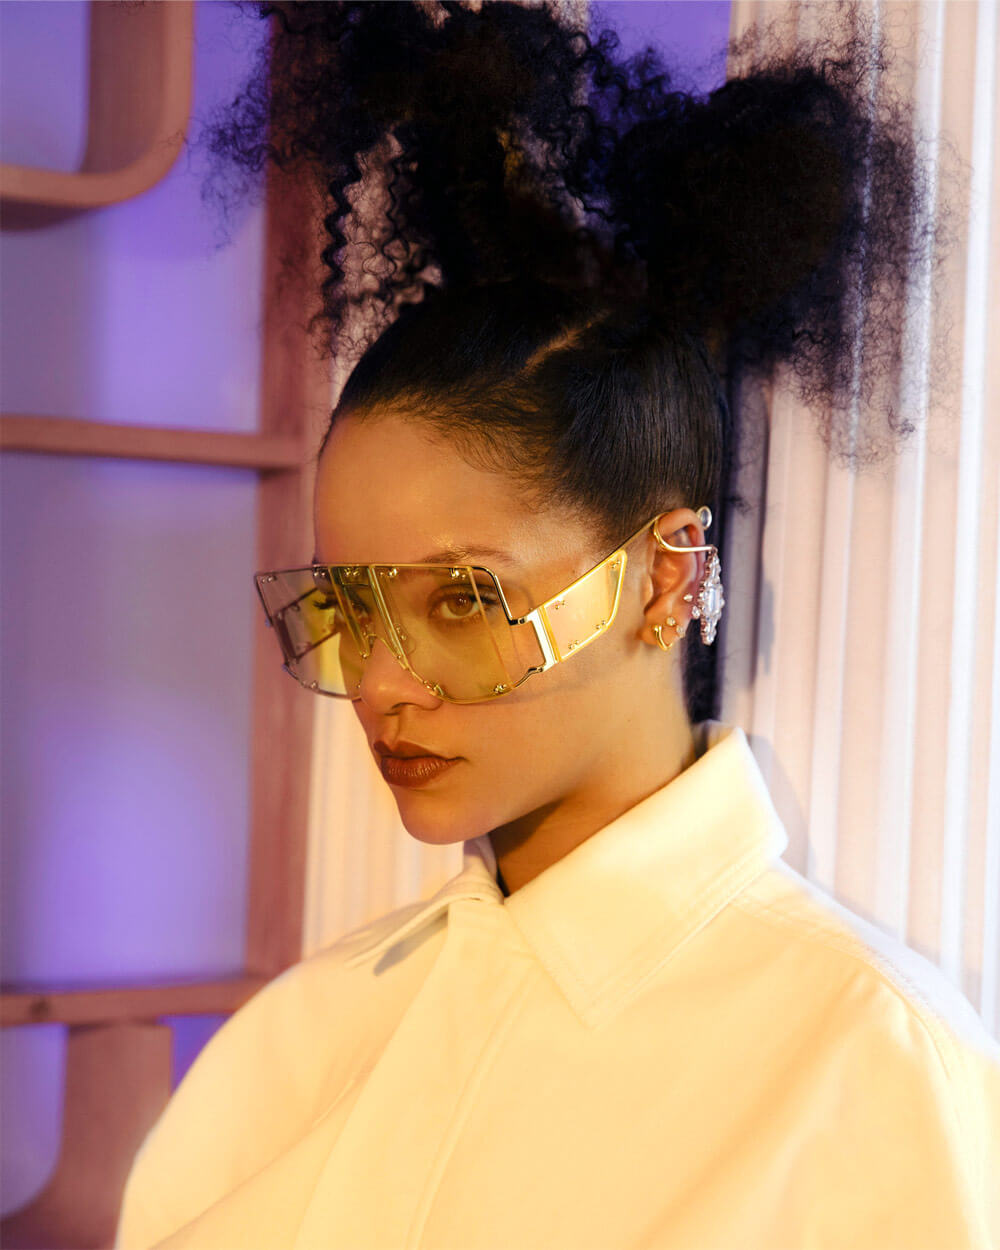 Rihanna eyewear style 2020